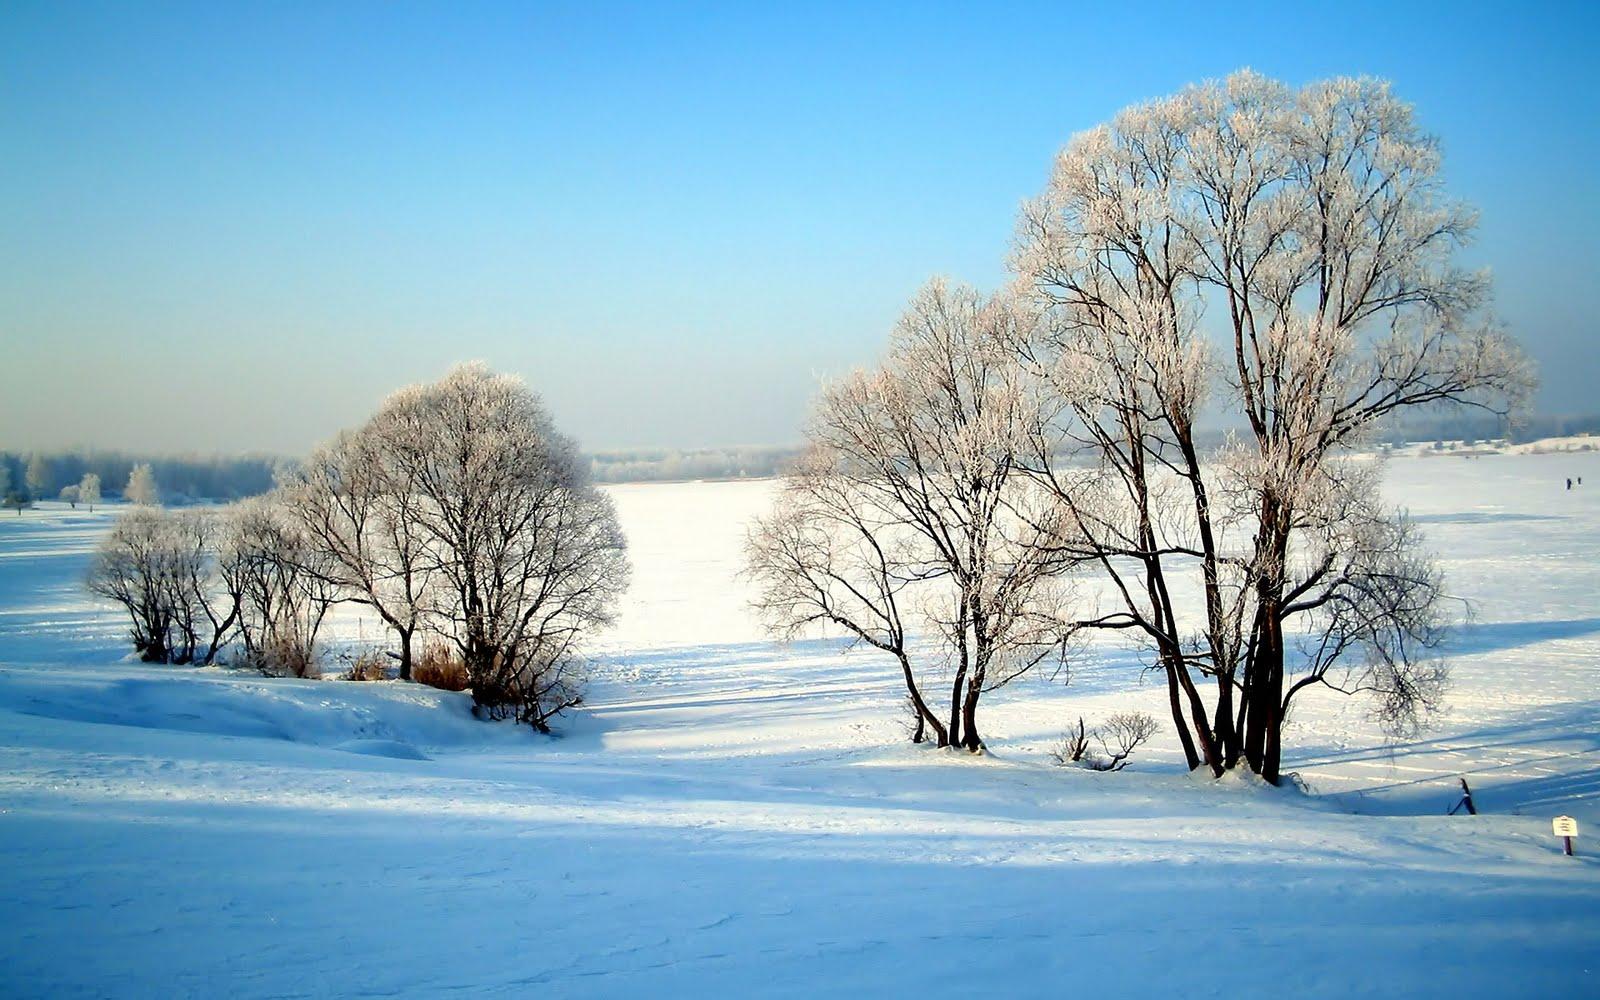 wallpapers winter wallpapers